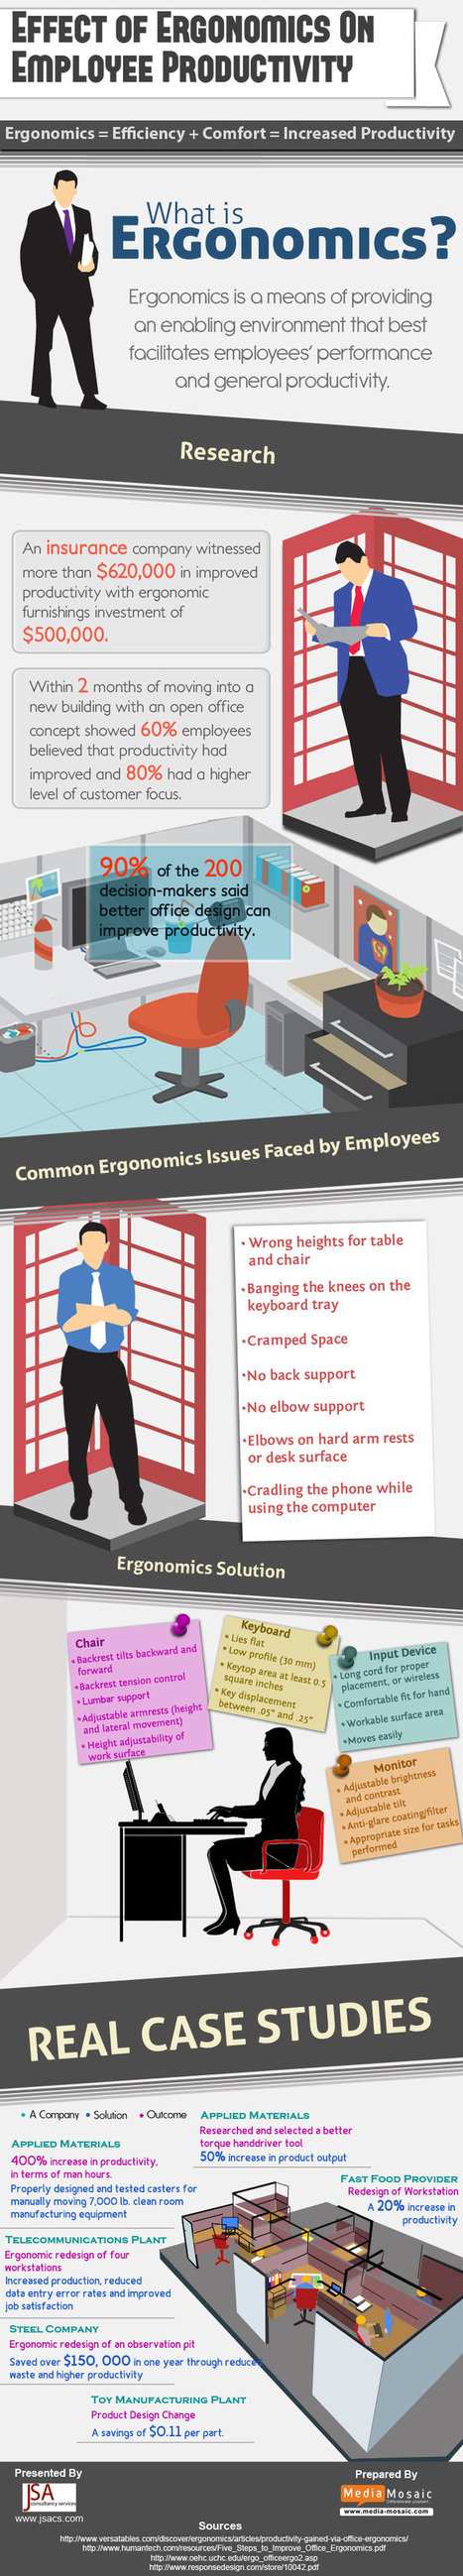 Effects of Ergonomics on Employee Productivity [INFOGRAPHIC] | Seguridad Industrial | Scoop.it